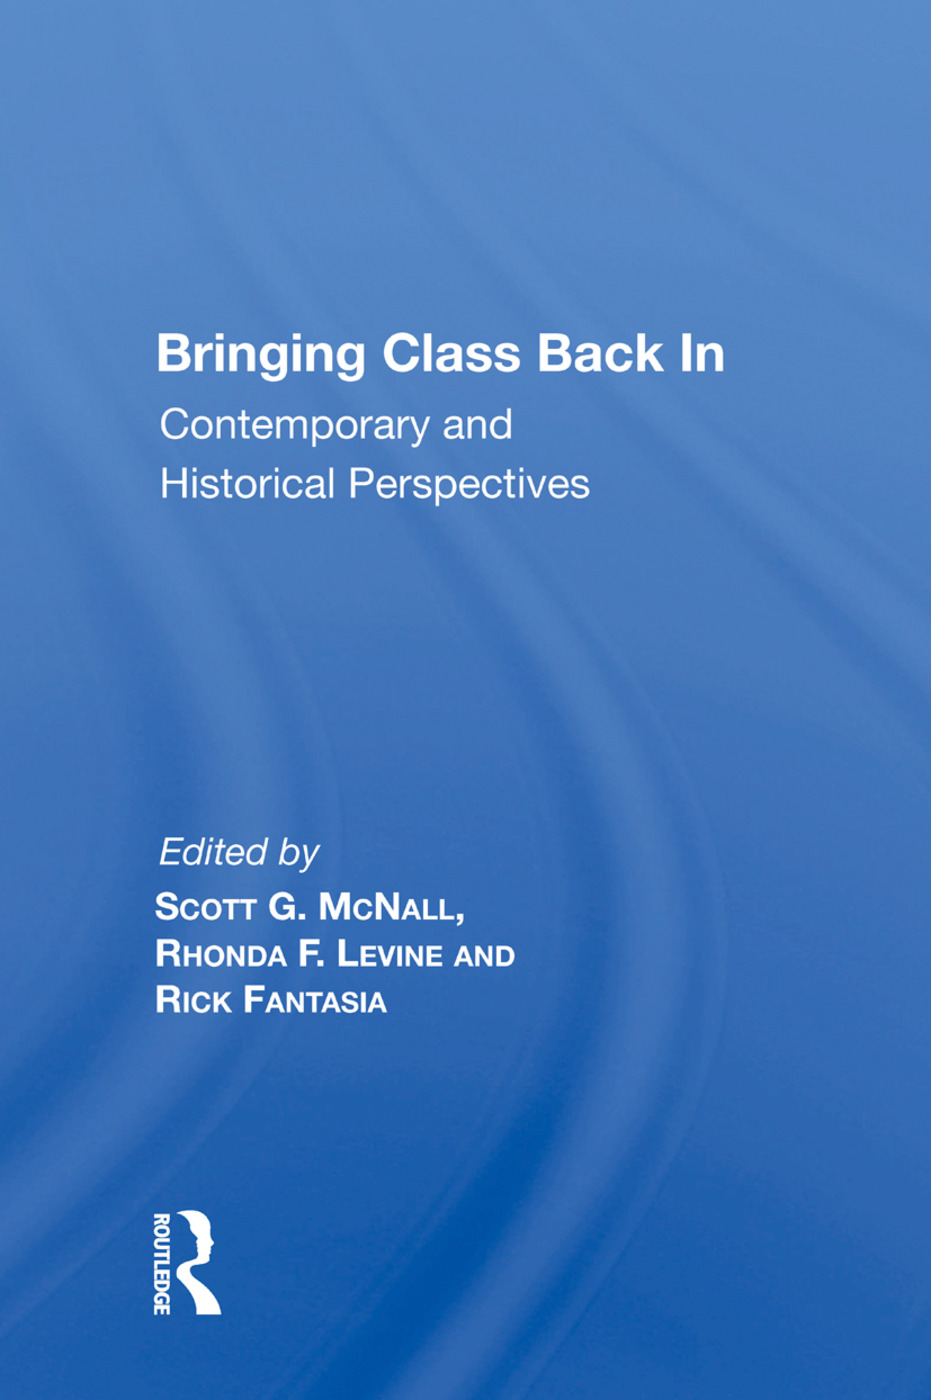 Bringing Class Back In